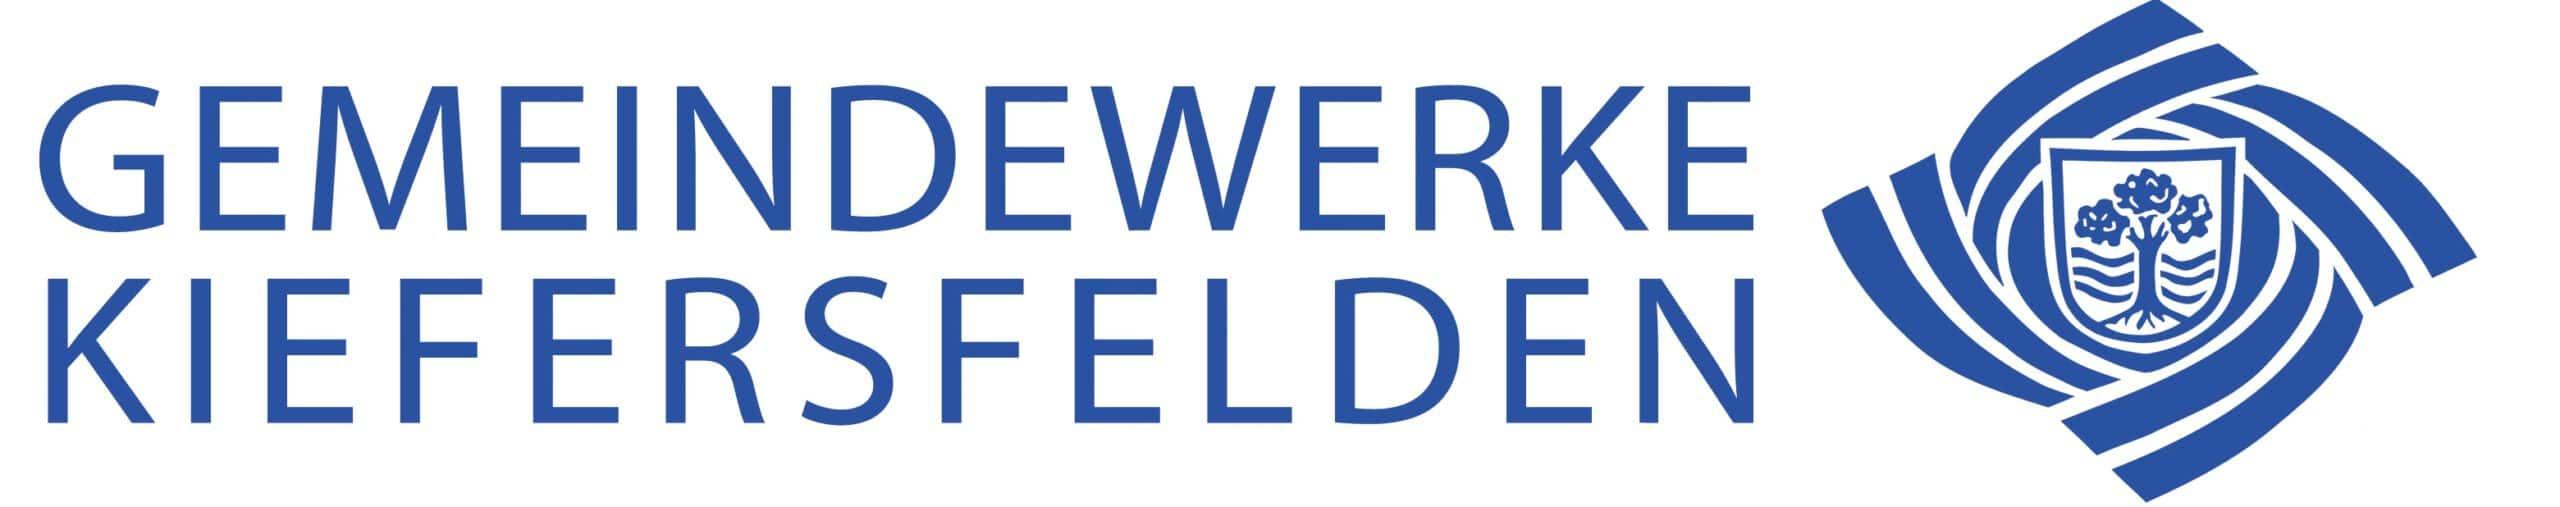 Gemeindewerke Kiefersfelden - Logo